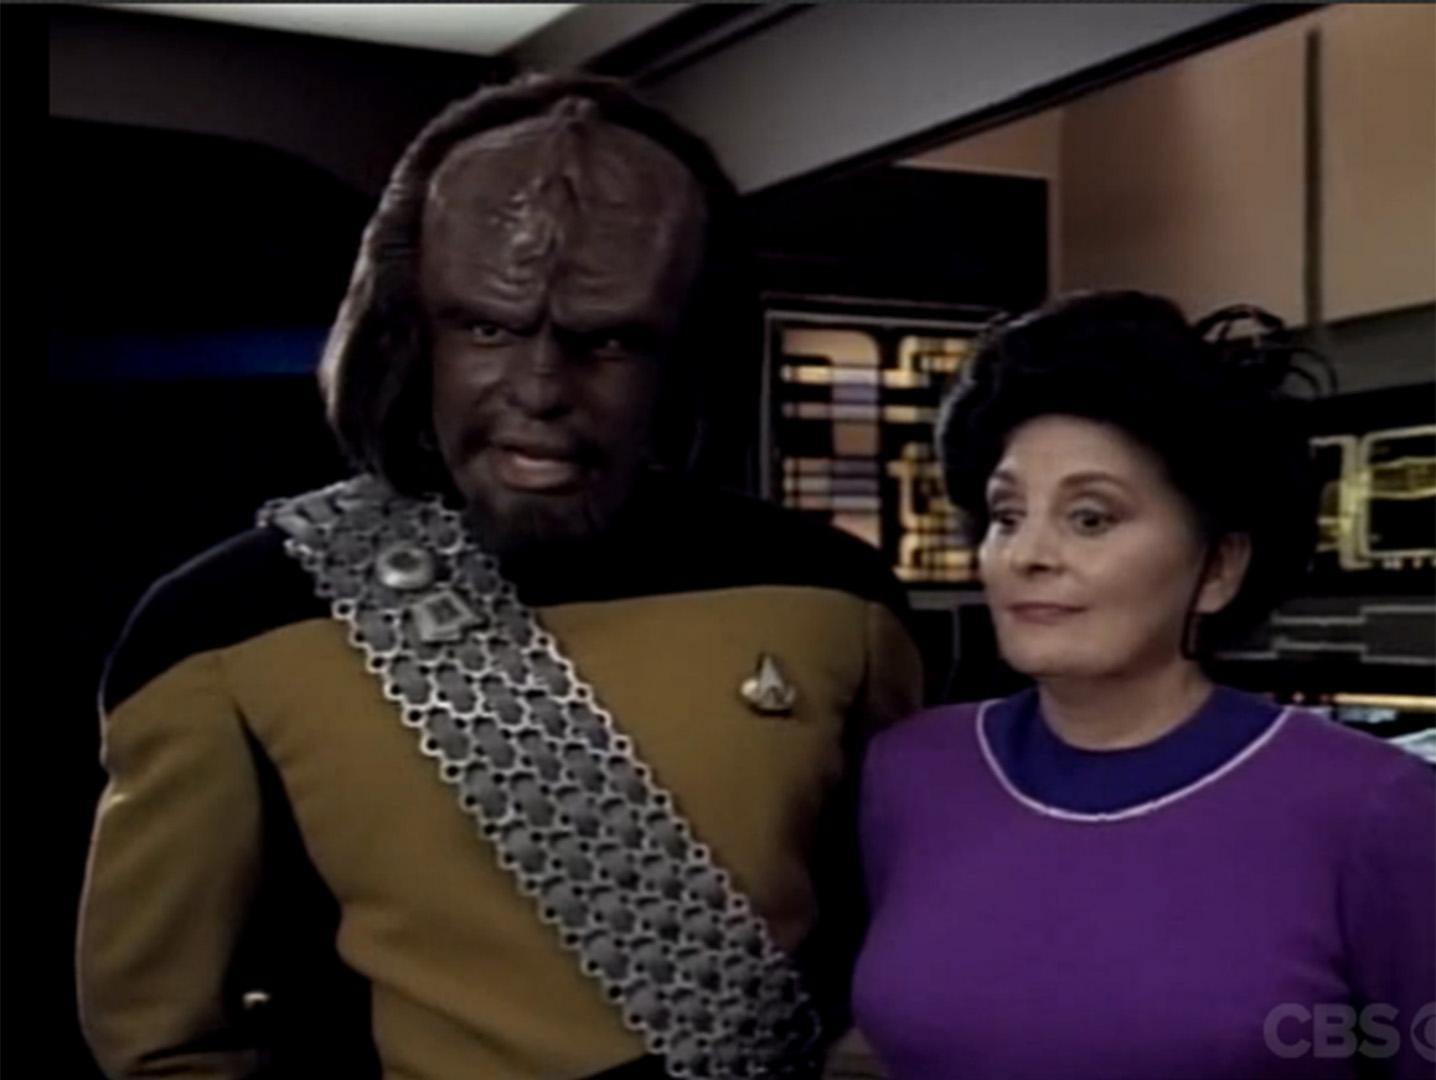 Family (Star Trek: The Next Generation, Season 4, Episode 2)